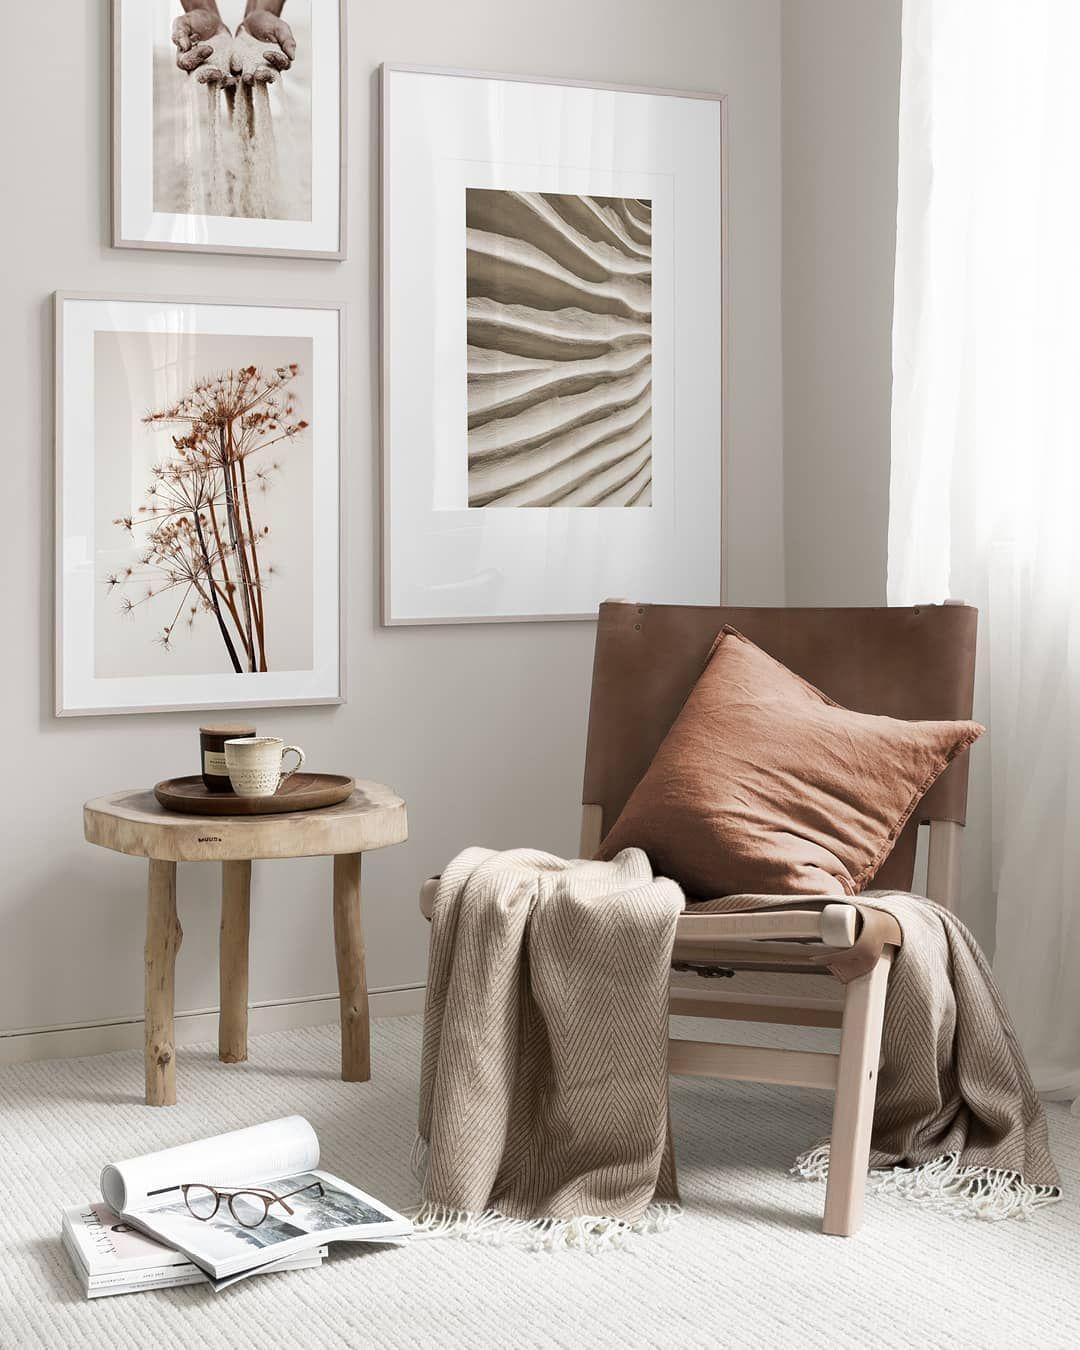 Decor Desenio Posters Online Desenio On Instagram 3 For 2 On Prints Ending Soon Shop Your Favorite Style Living Room Decor Bedroom Interior Home Decor